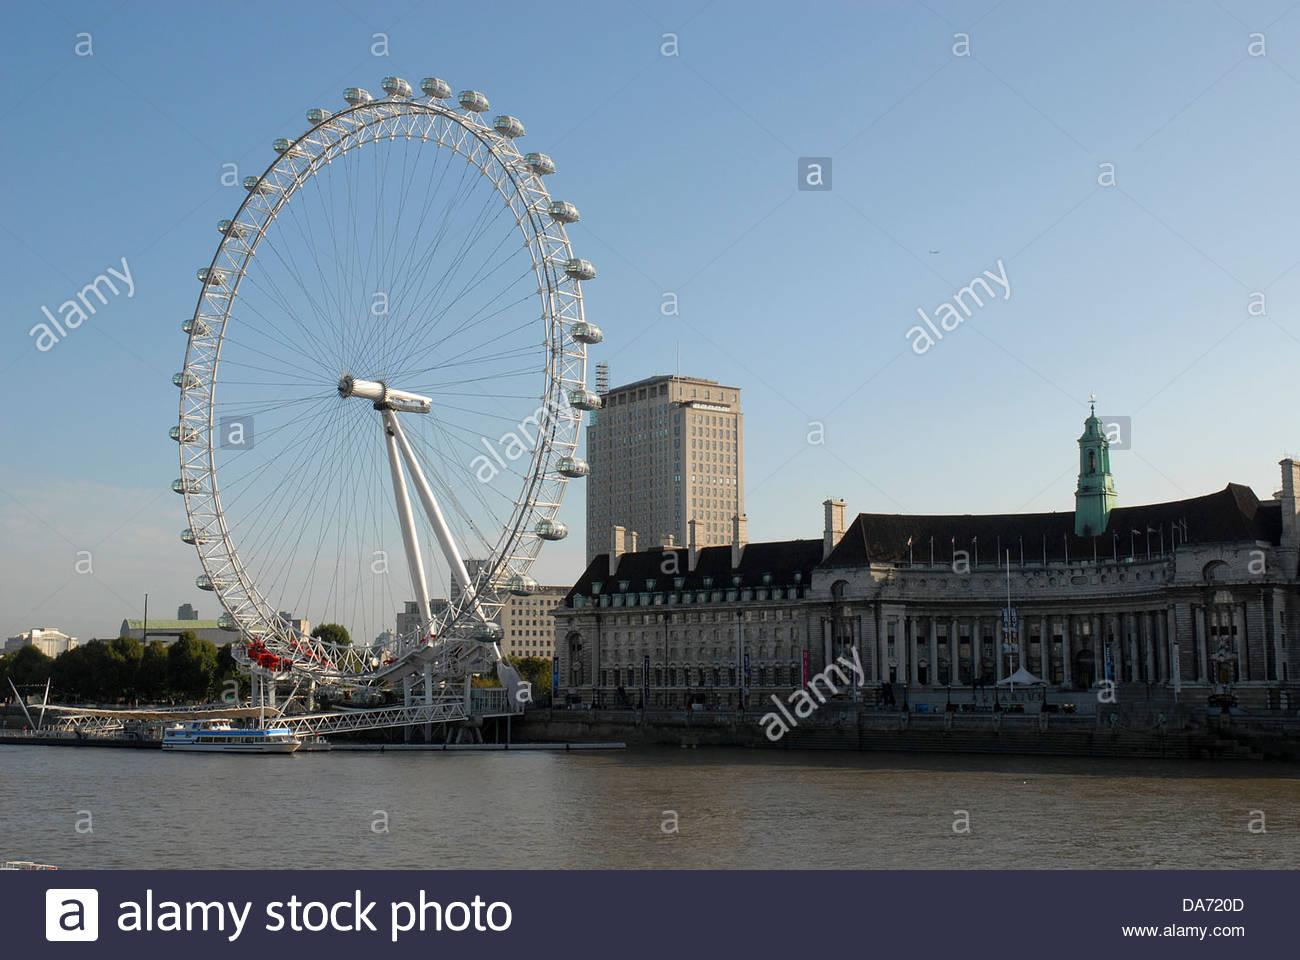 the merlin entertainments london eye,london,uk - Stock Image